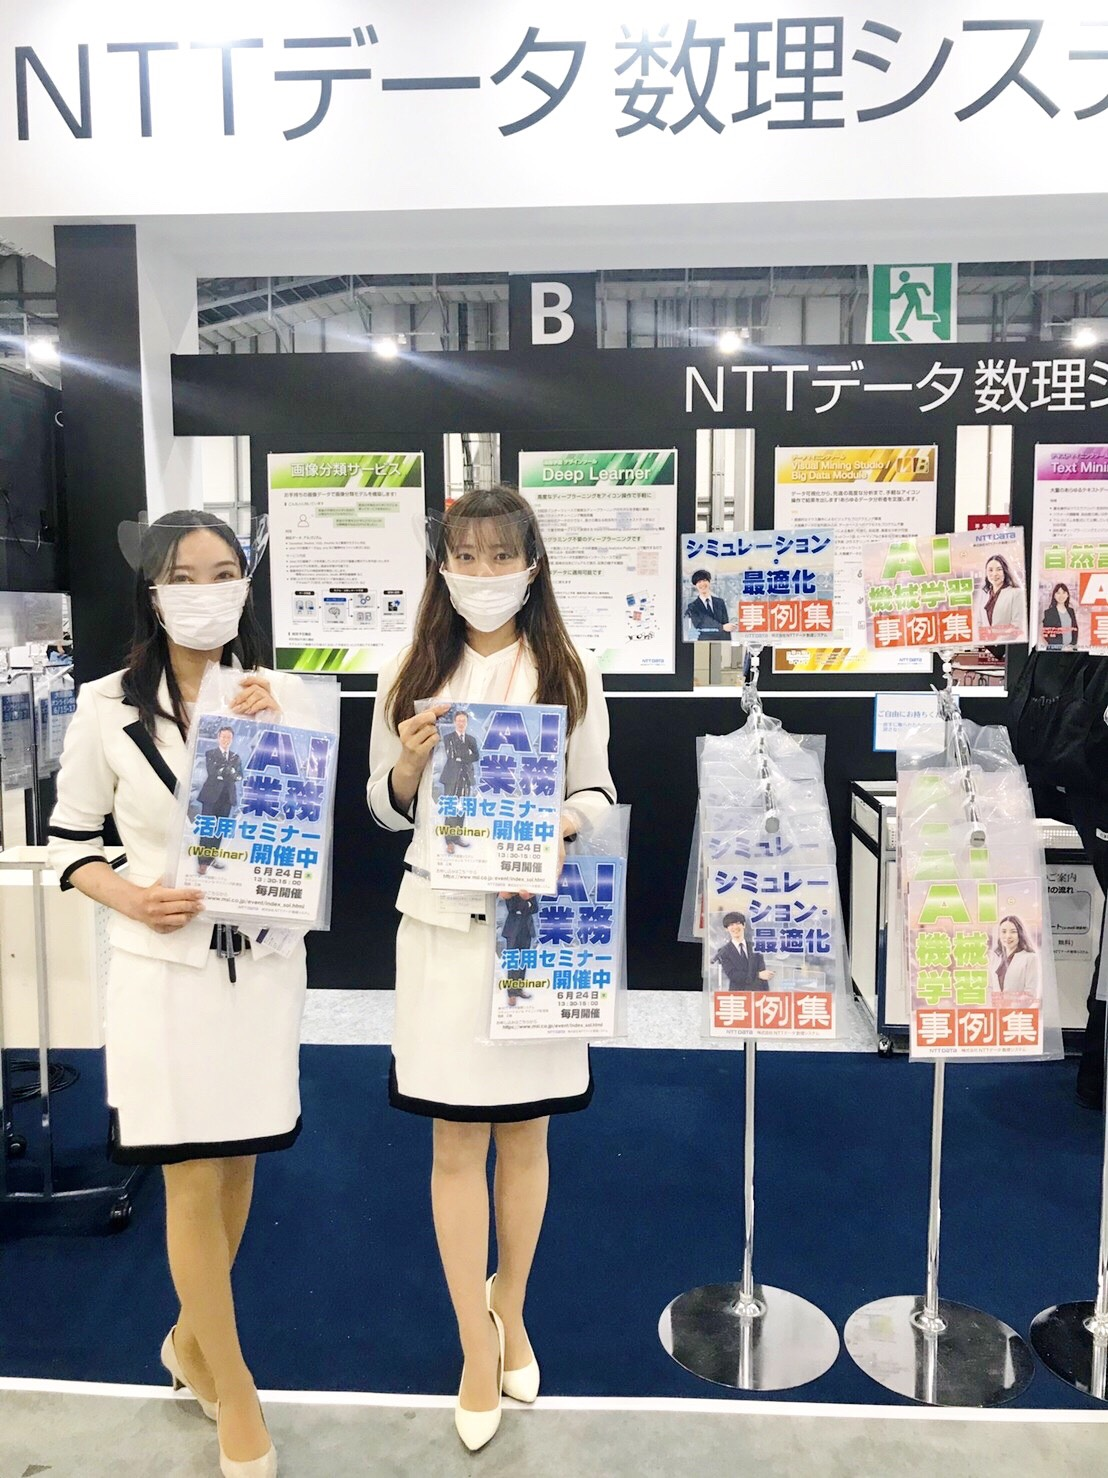 AI・業務自動化展【春】@東京ビッグサイト